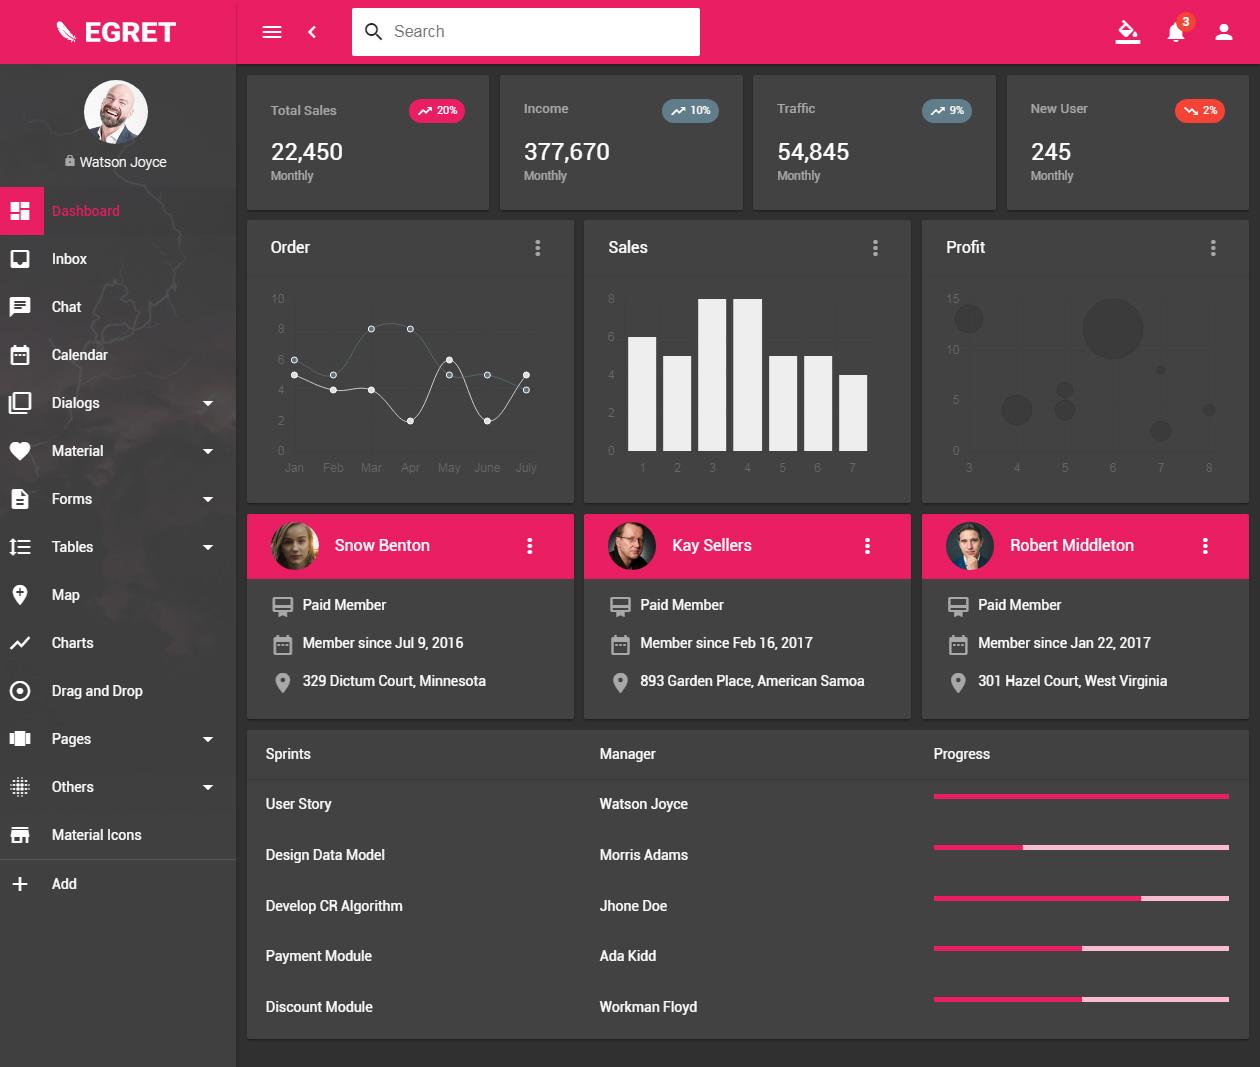 Egret - Premium Responsive Material Design Admin HTML5 Template